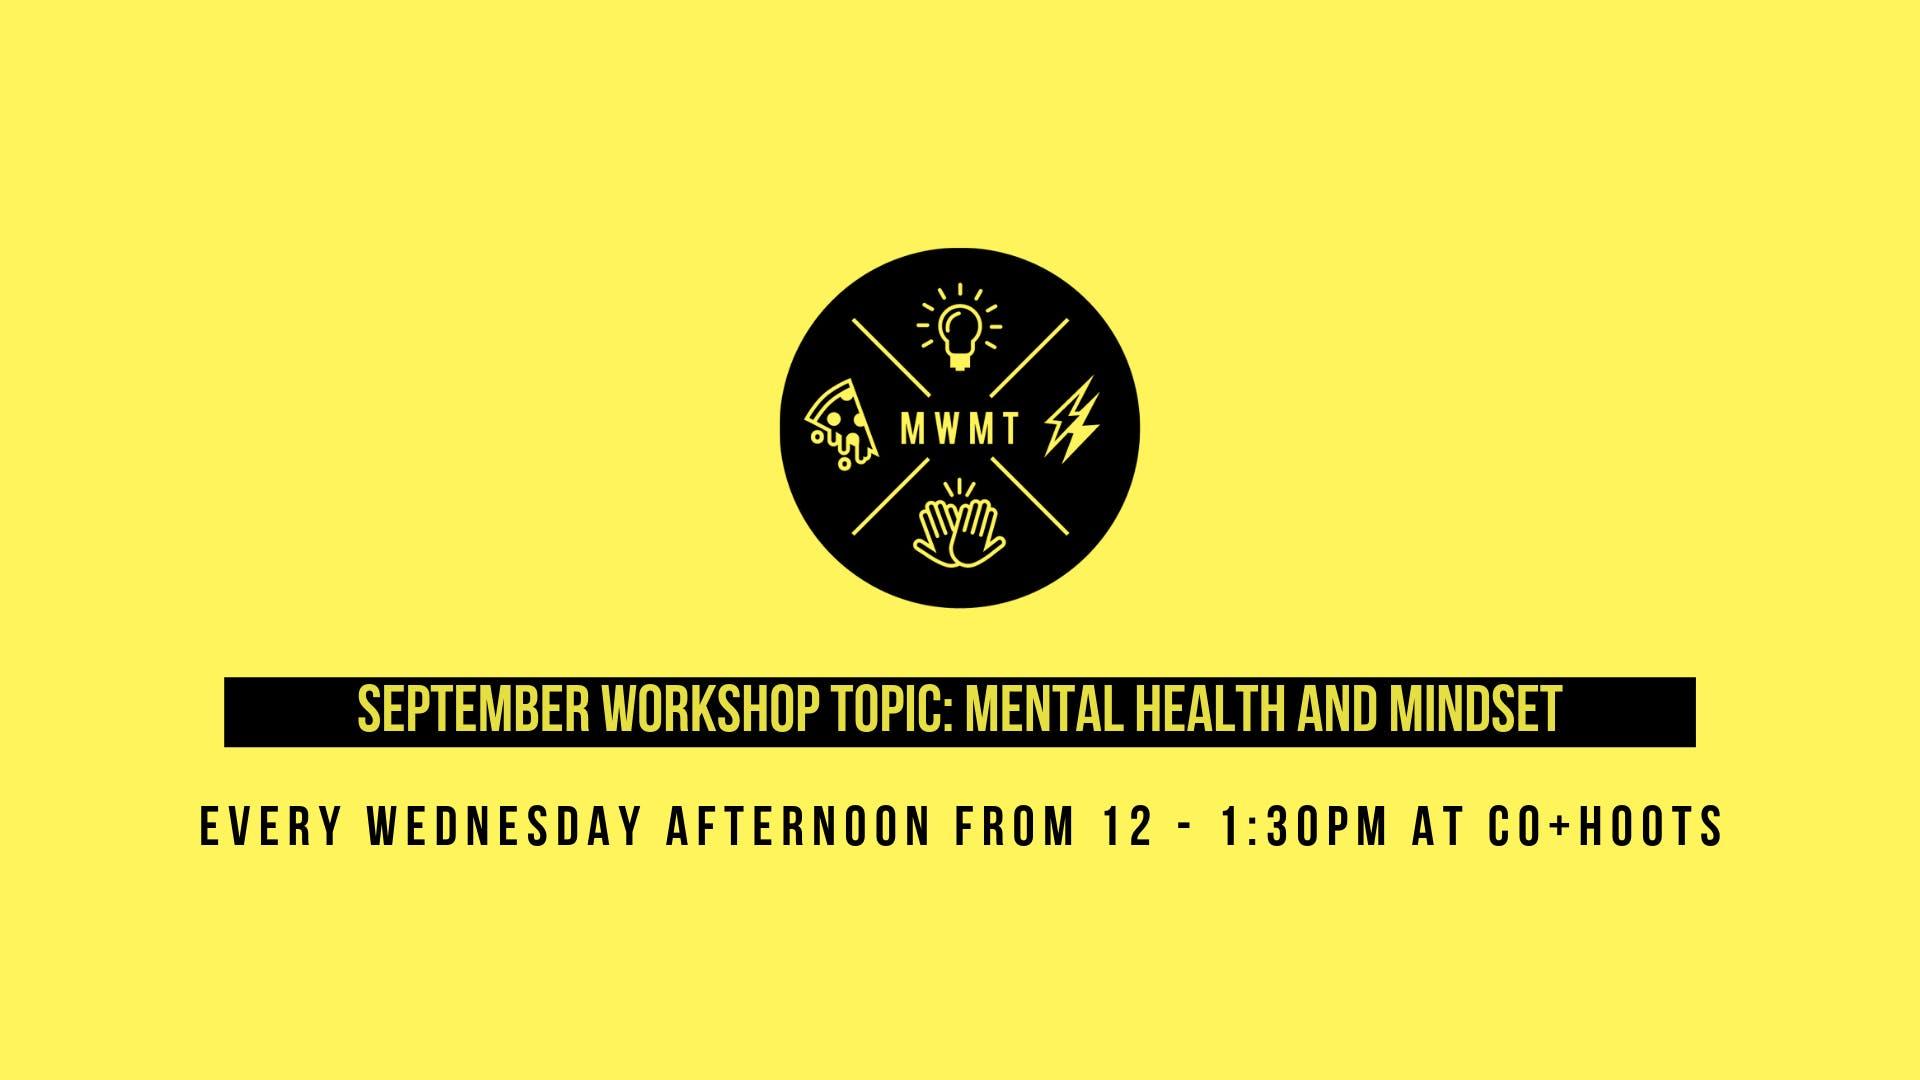 Mindfulness for Mindset: Manage your mind to manage your mindset.